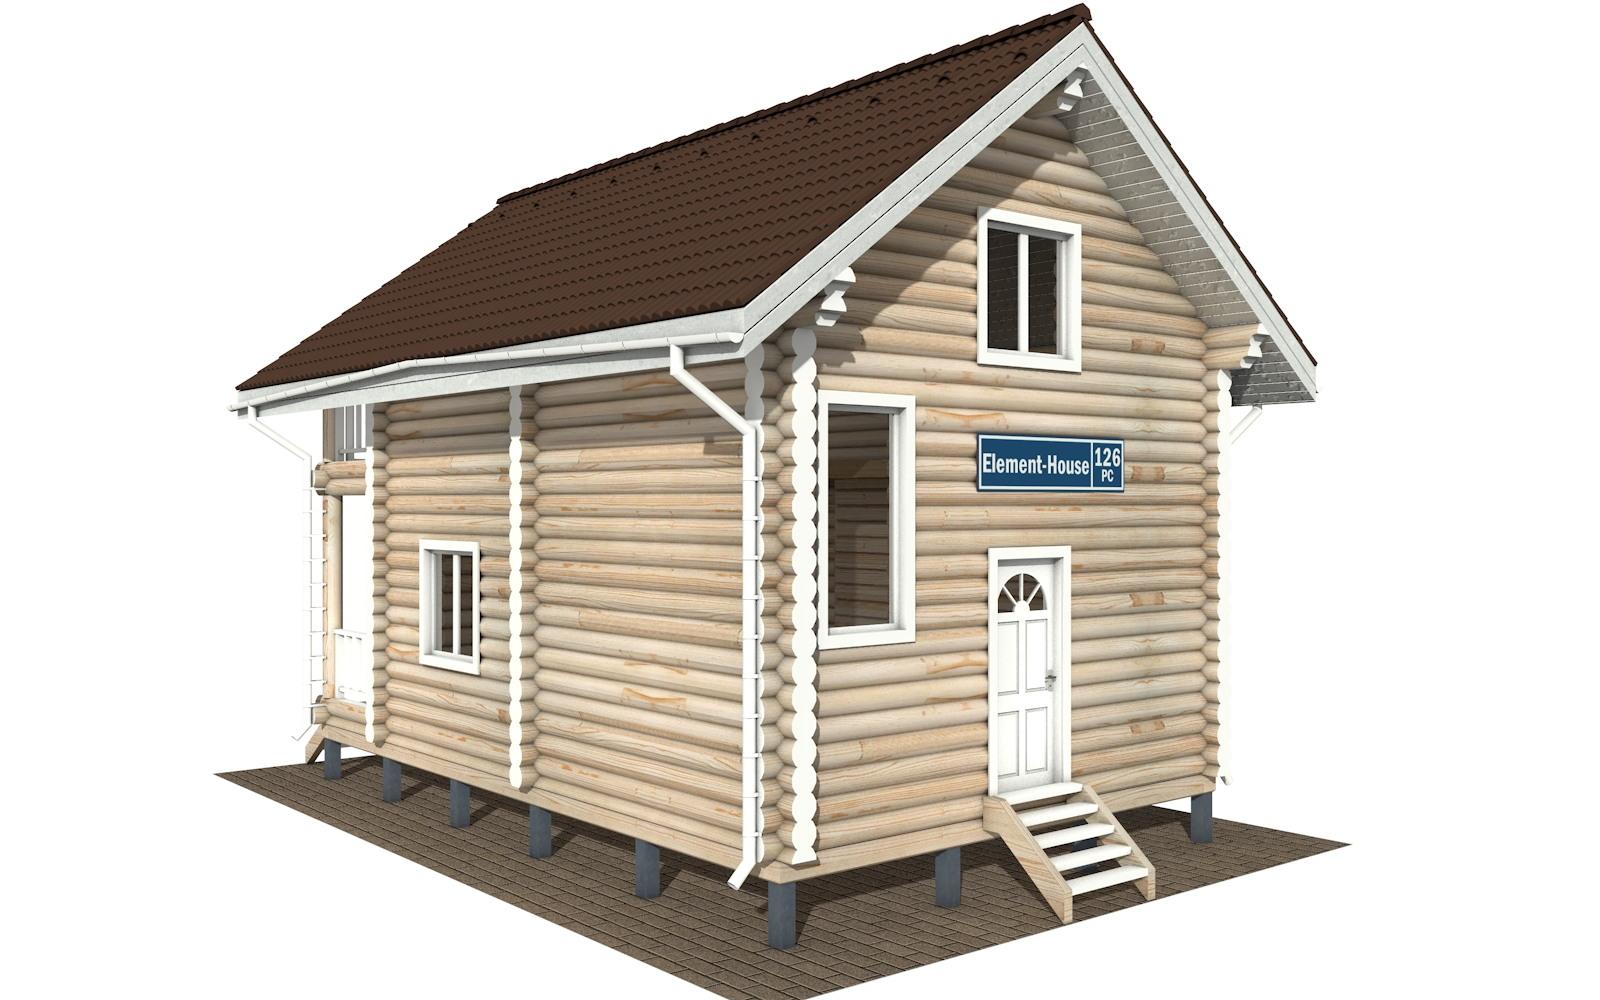 РС-126 - Проект дома из бревна с мансардой